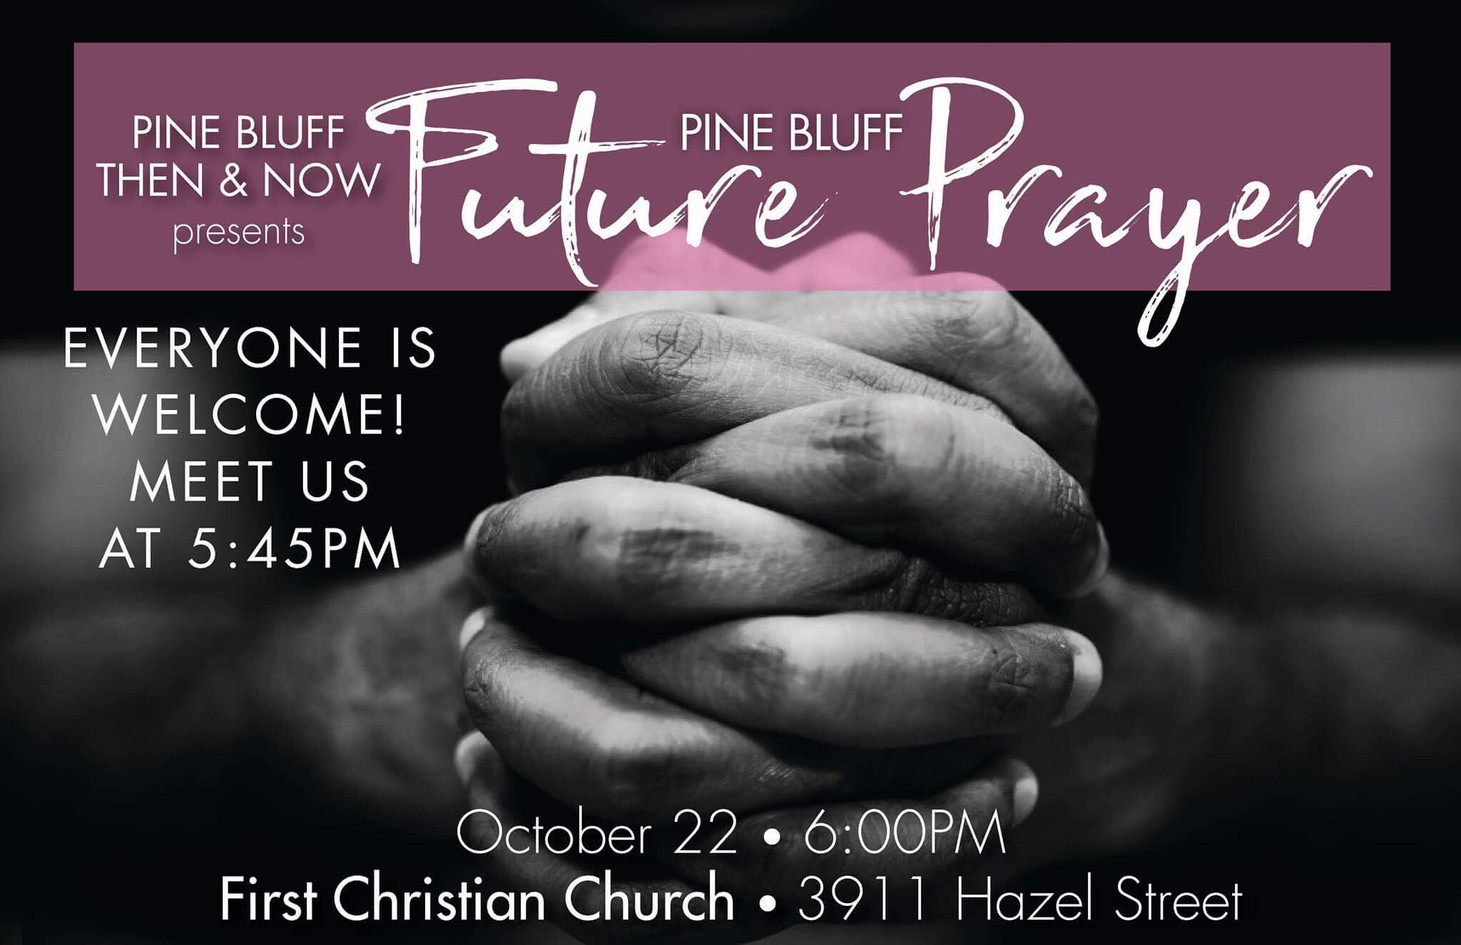 Pine Bluff Future Prayer